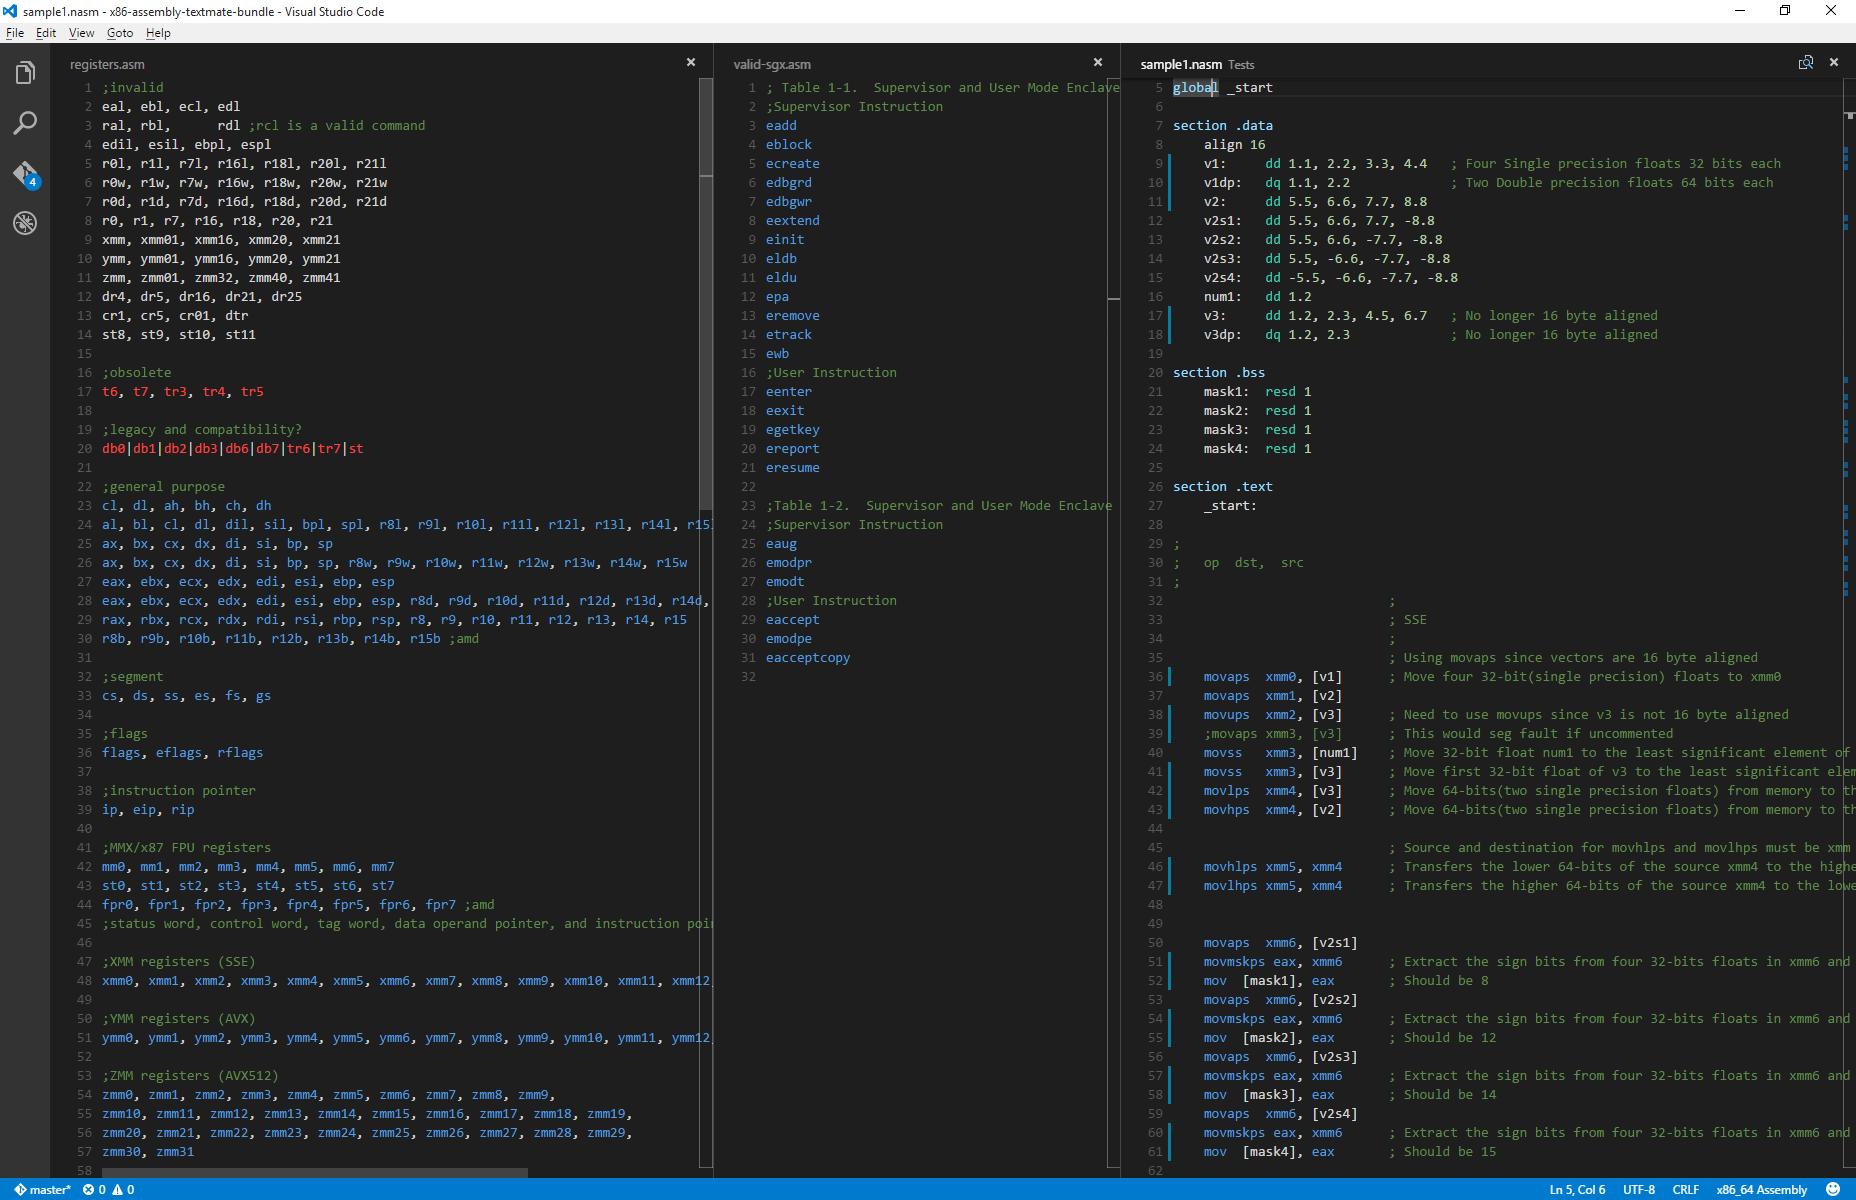 Visual Studio Code with default Dark color theme